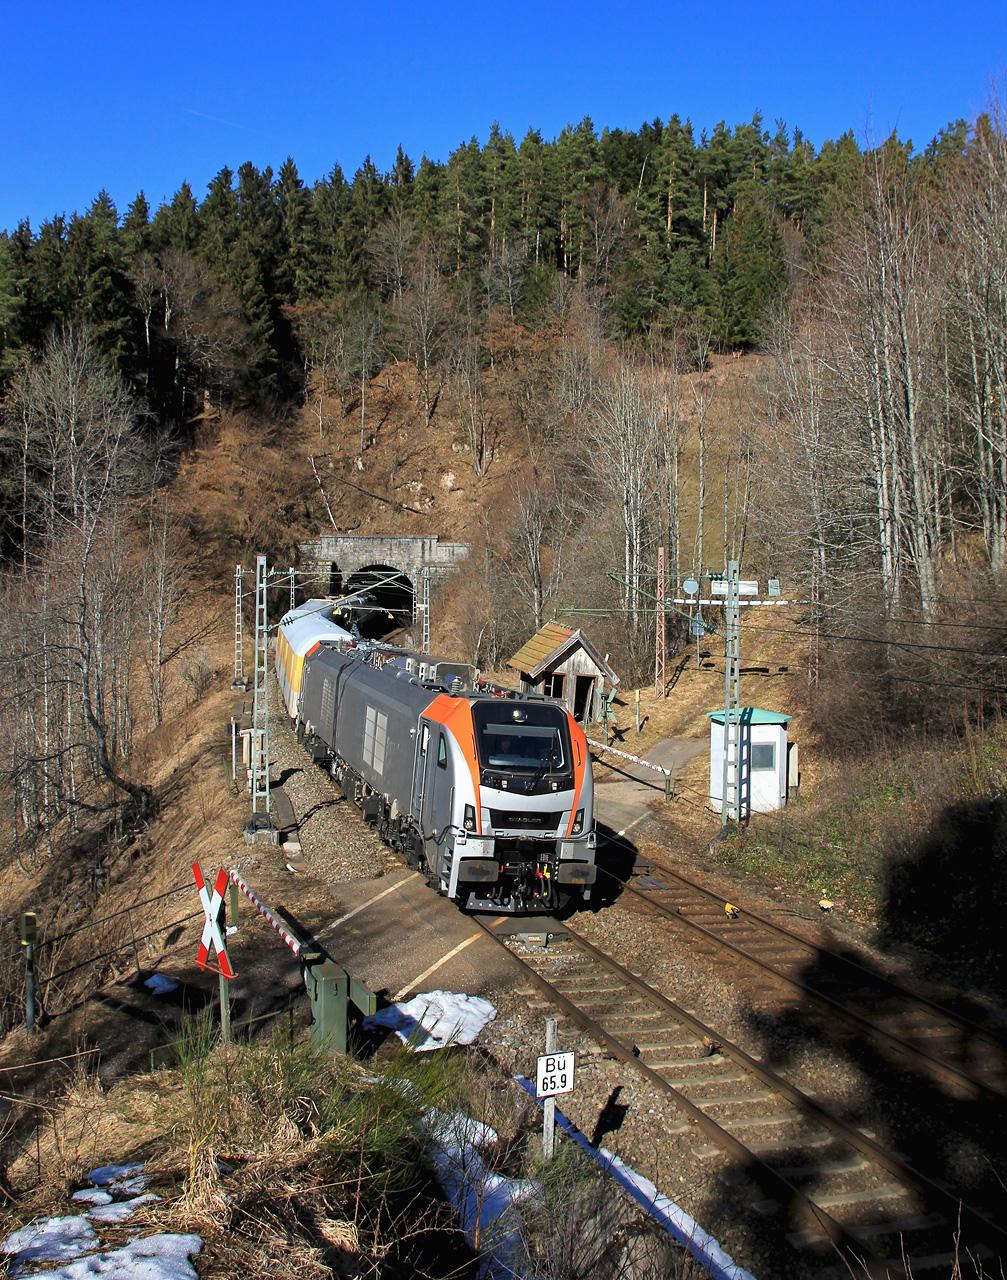 http://www.badische-schwarzwaldbahn.de/DSO/E76.jpg